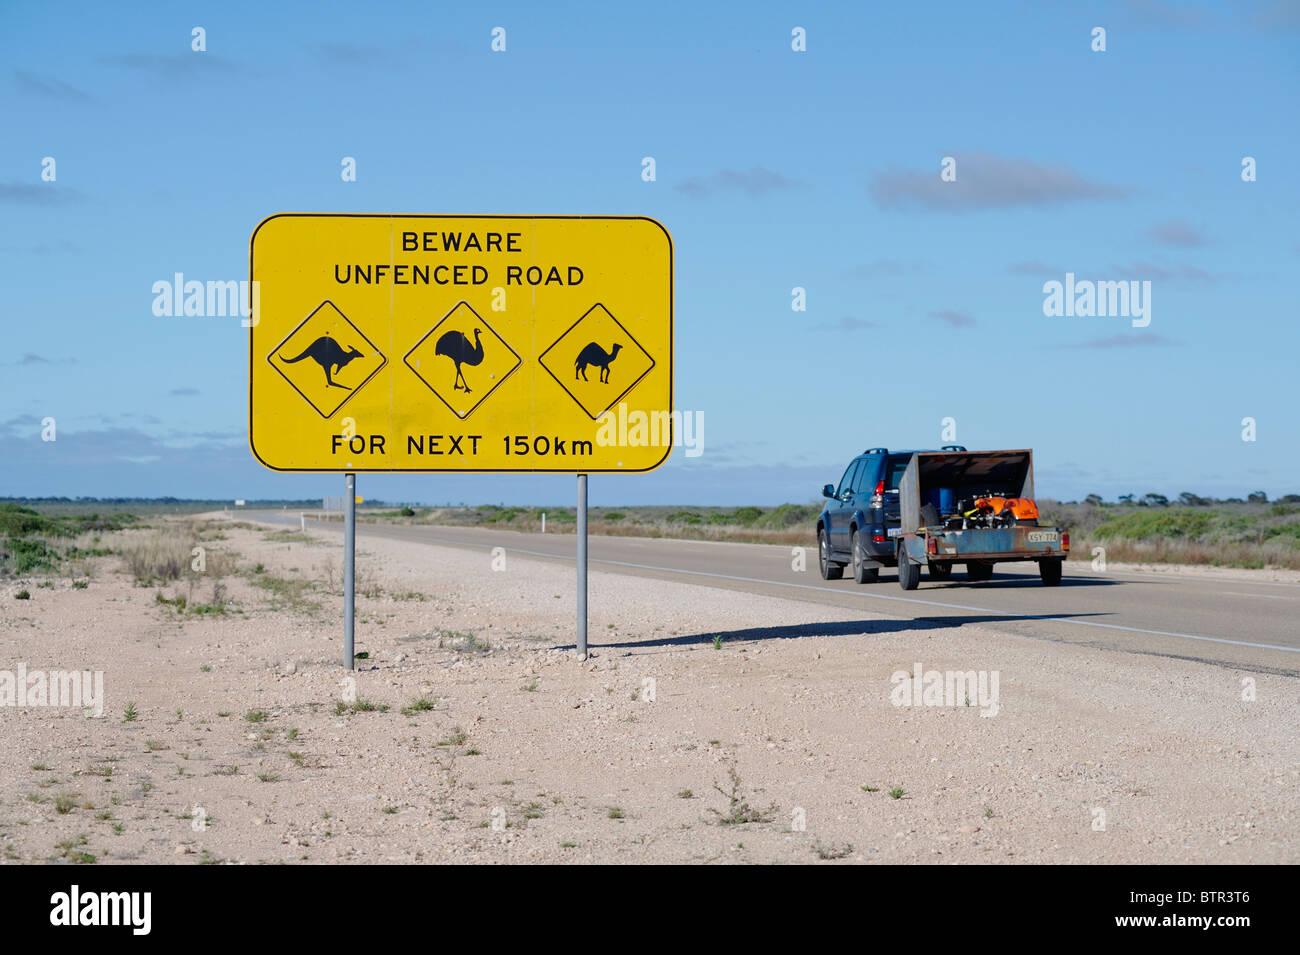 Australia, Animal crossing sign on roadside - Stock Image